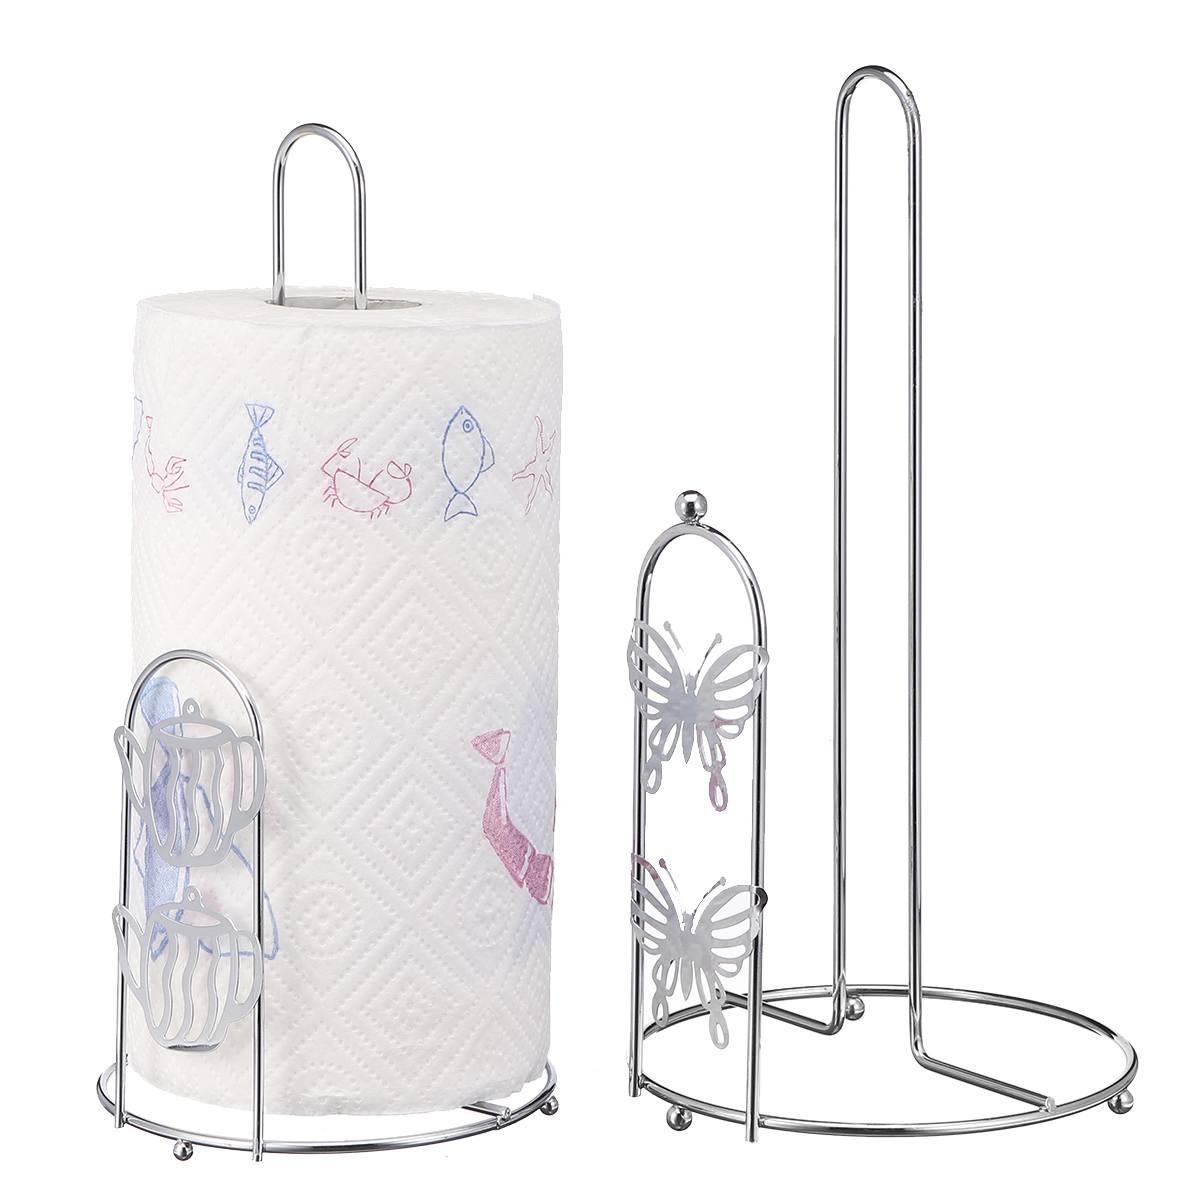 Stainless Iron Kitchen Table Roll Paper Towel Holder Stand Rack Organizer Storage Shelf Kitchen Bathroom Hardware Paper Holders